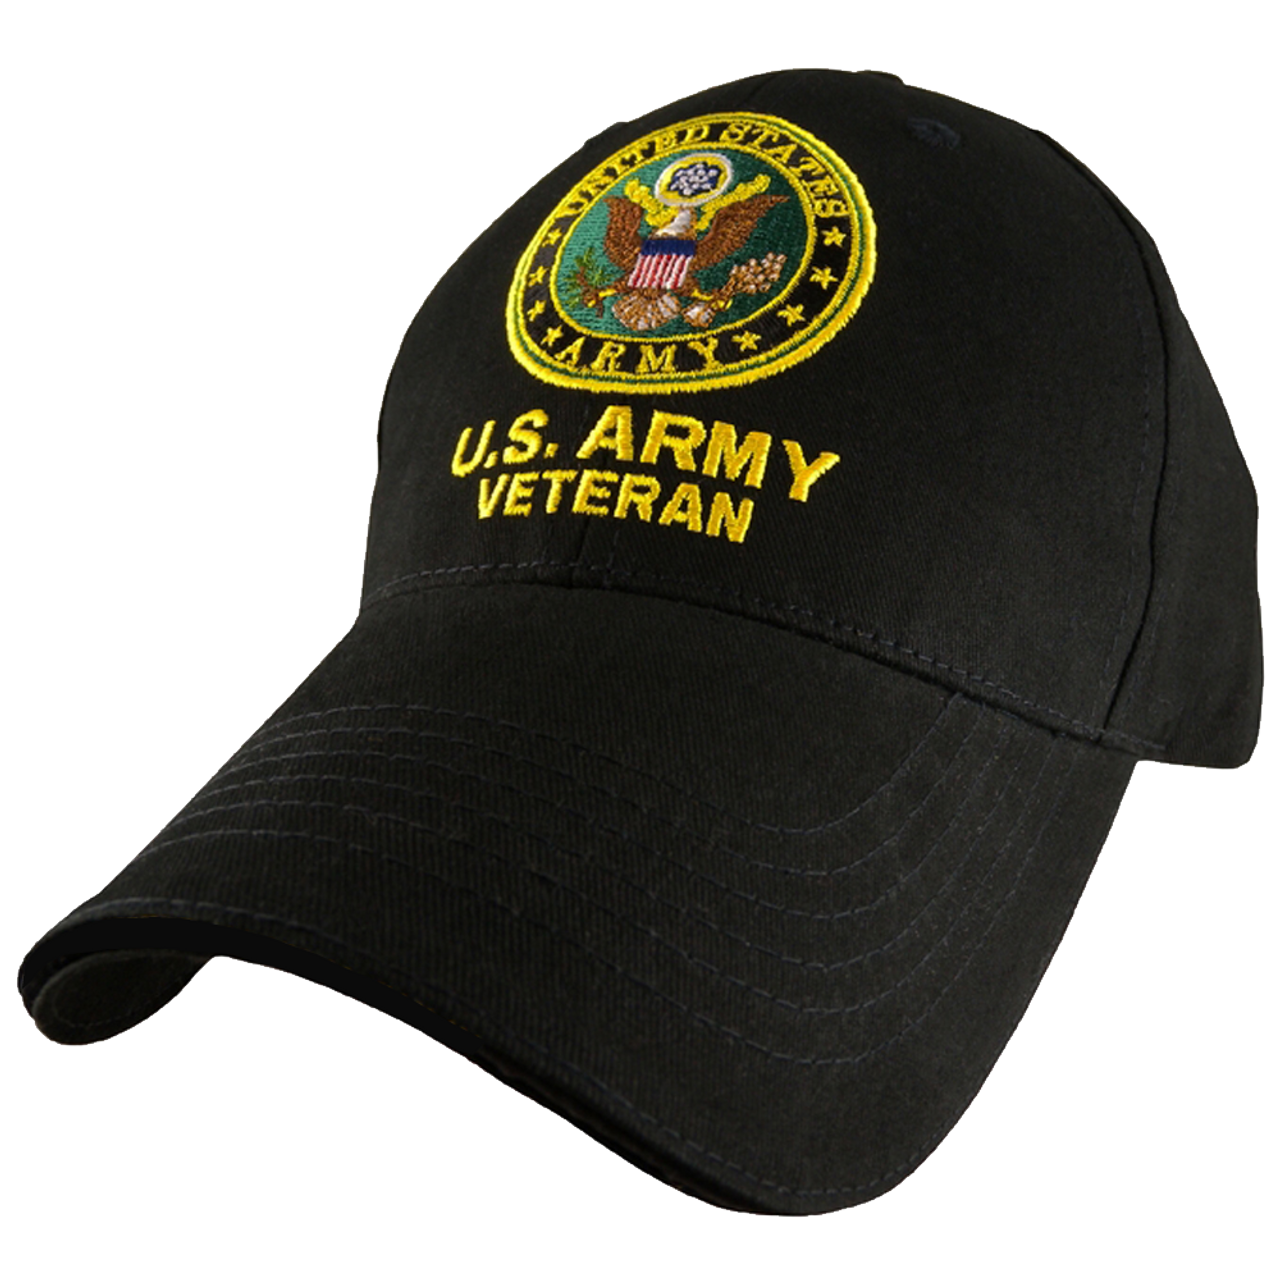 Black Eagle Crest U.S Army Veteran Baseball Cap